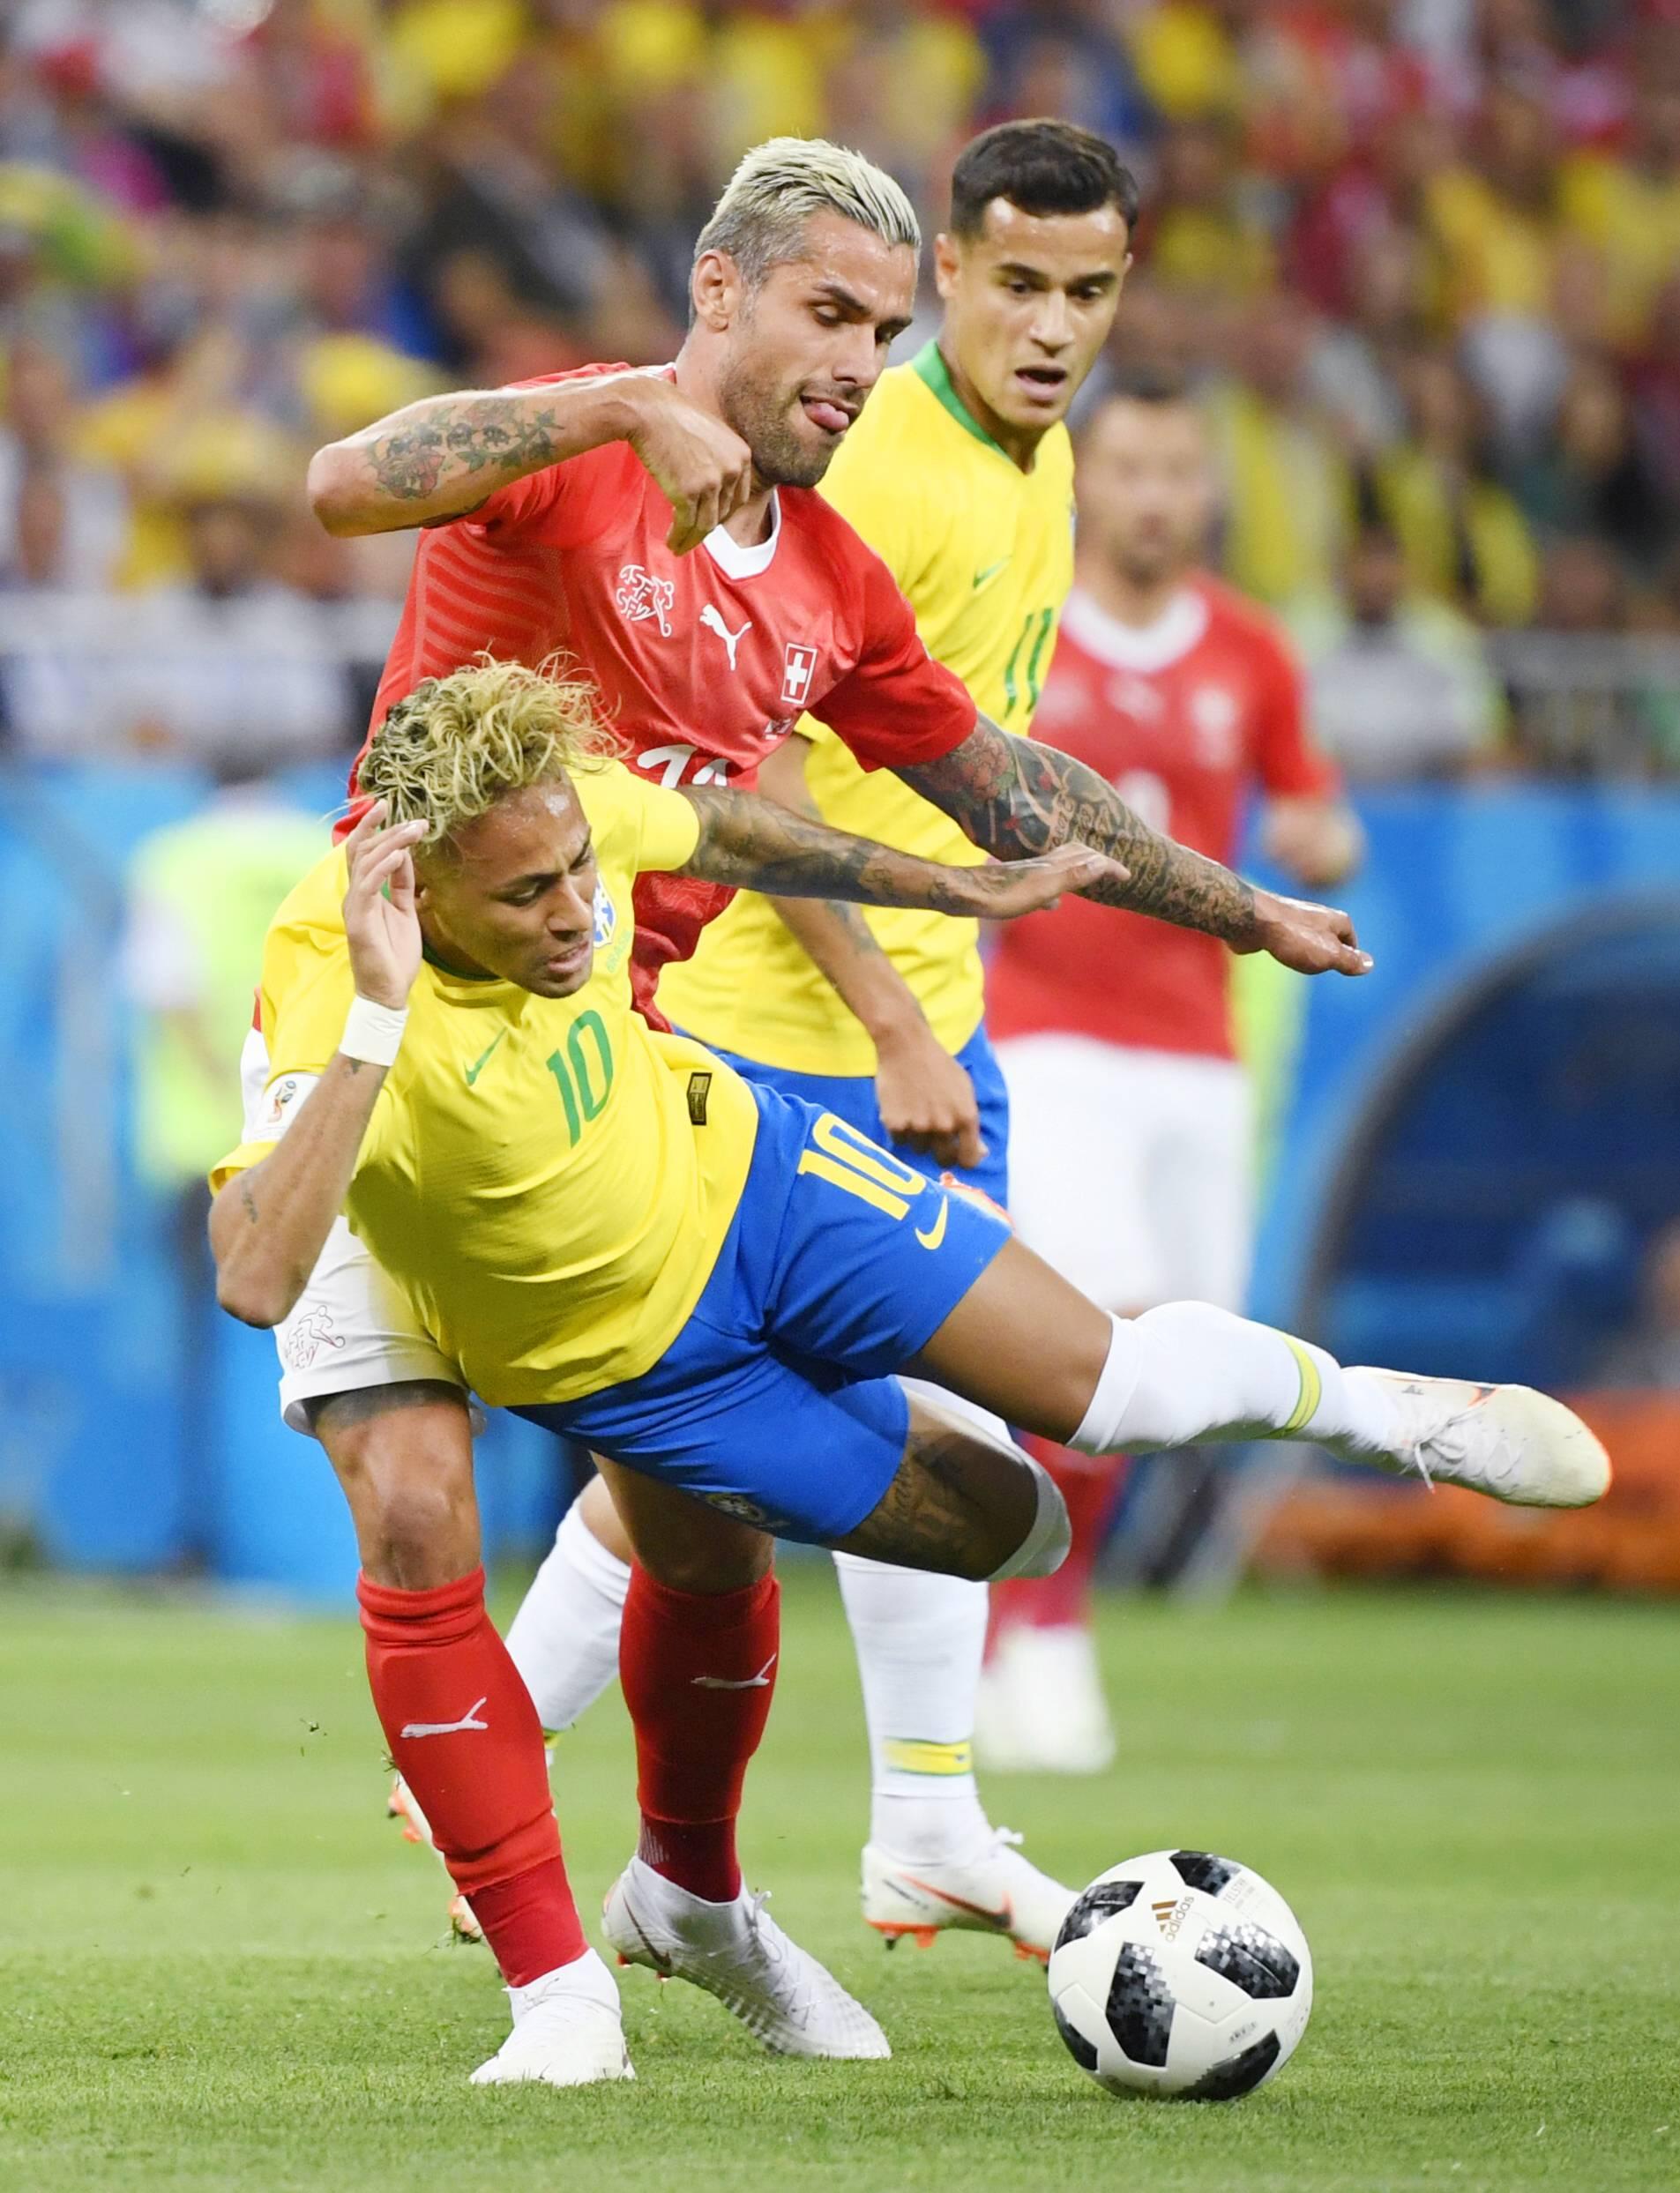 Fussball Wm 2018 Neymar Soll Brasilien Zum Titel Zaubern